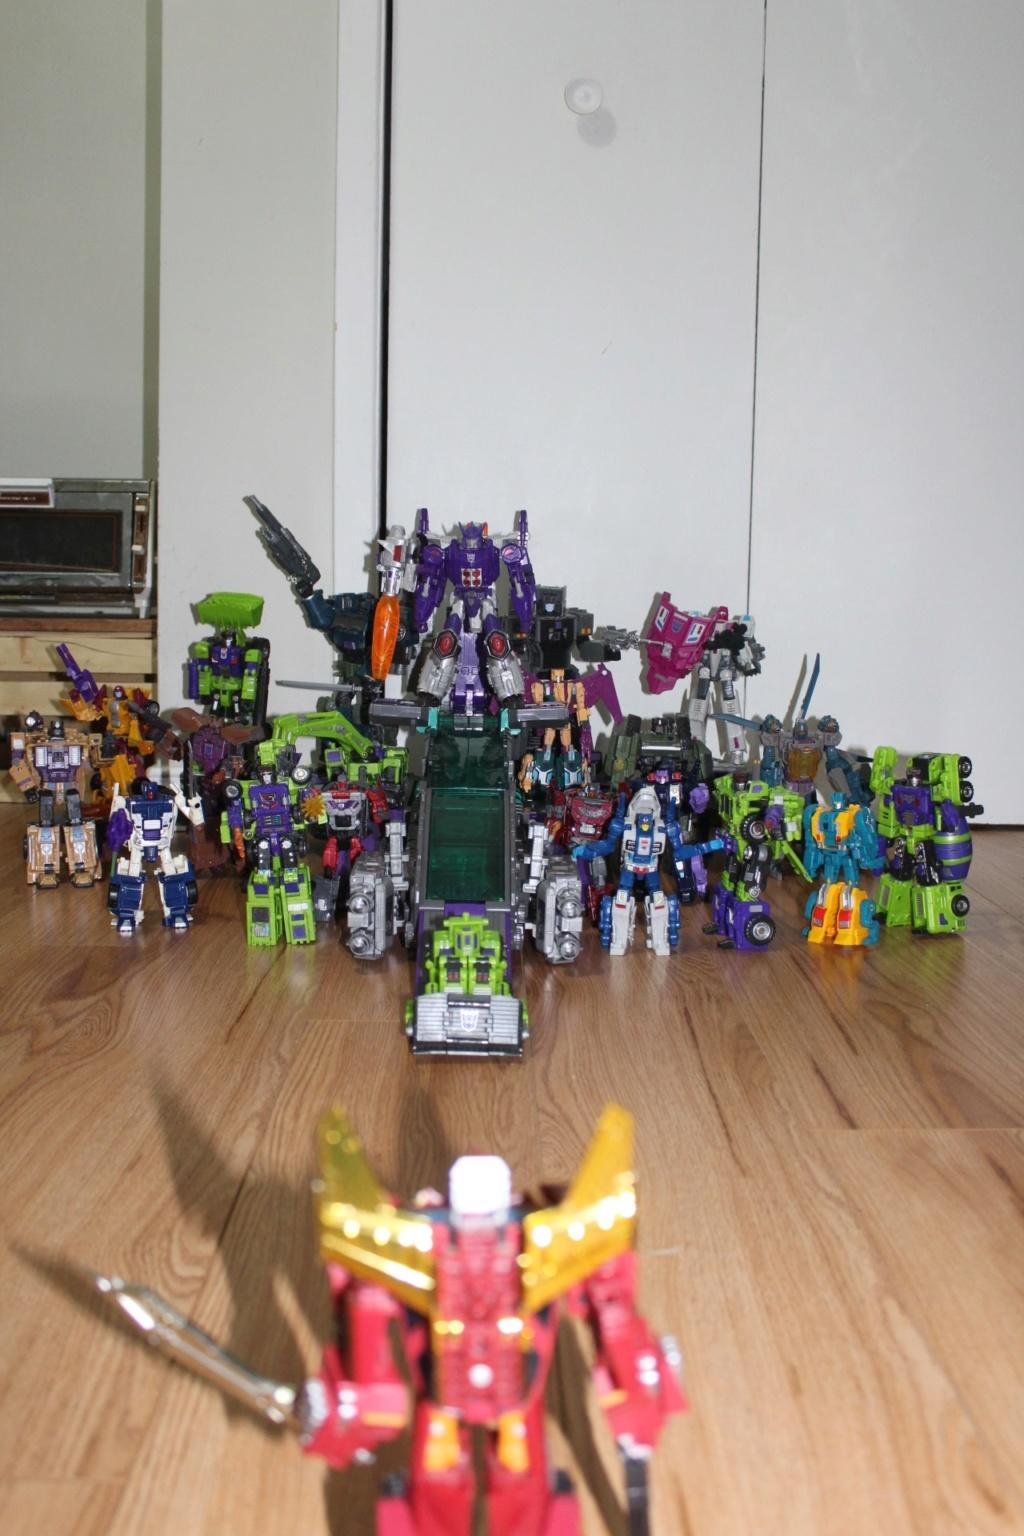 Vos montages photos Transformers ― Vos Batailles/Guerres | Humoristiques | Vos modes Stealth Force | etc - Page 14 62077910